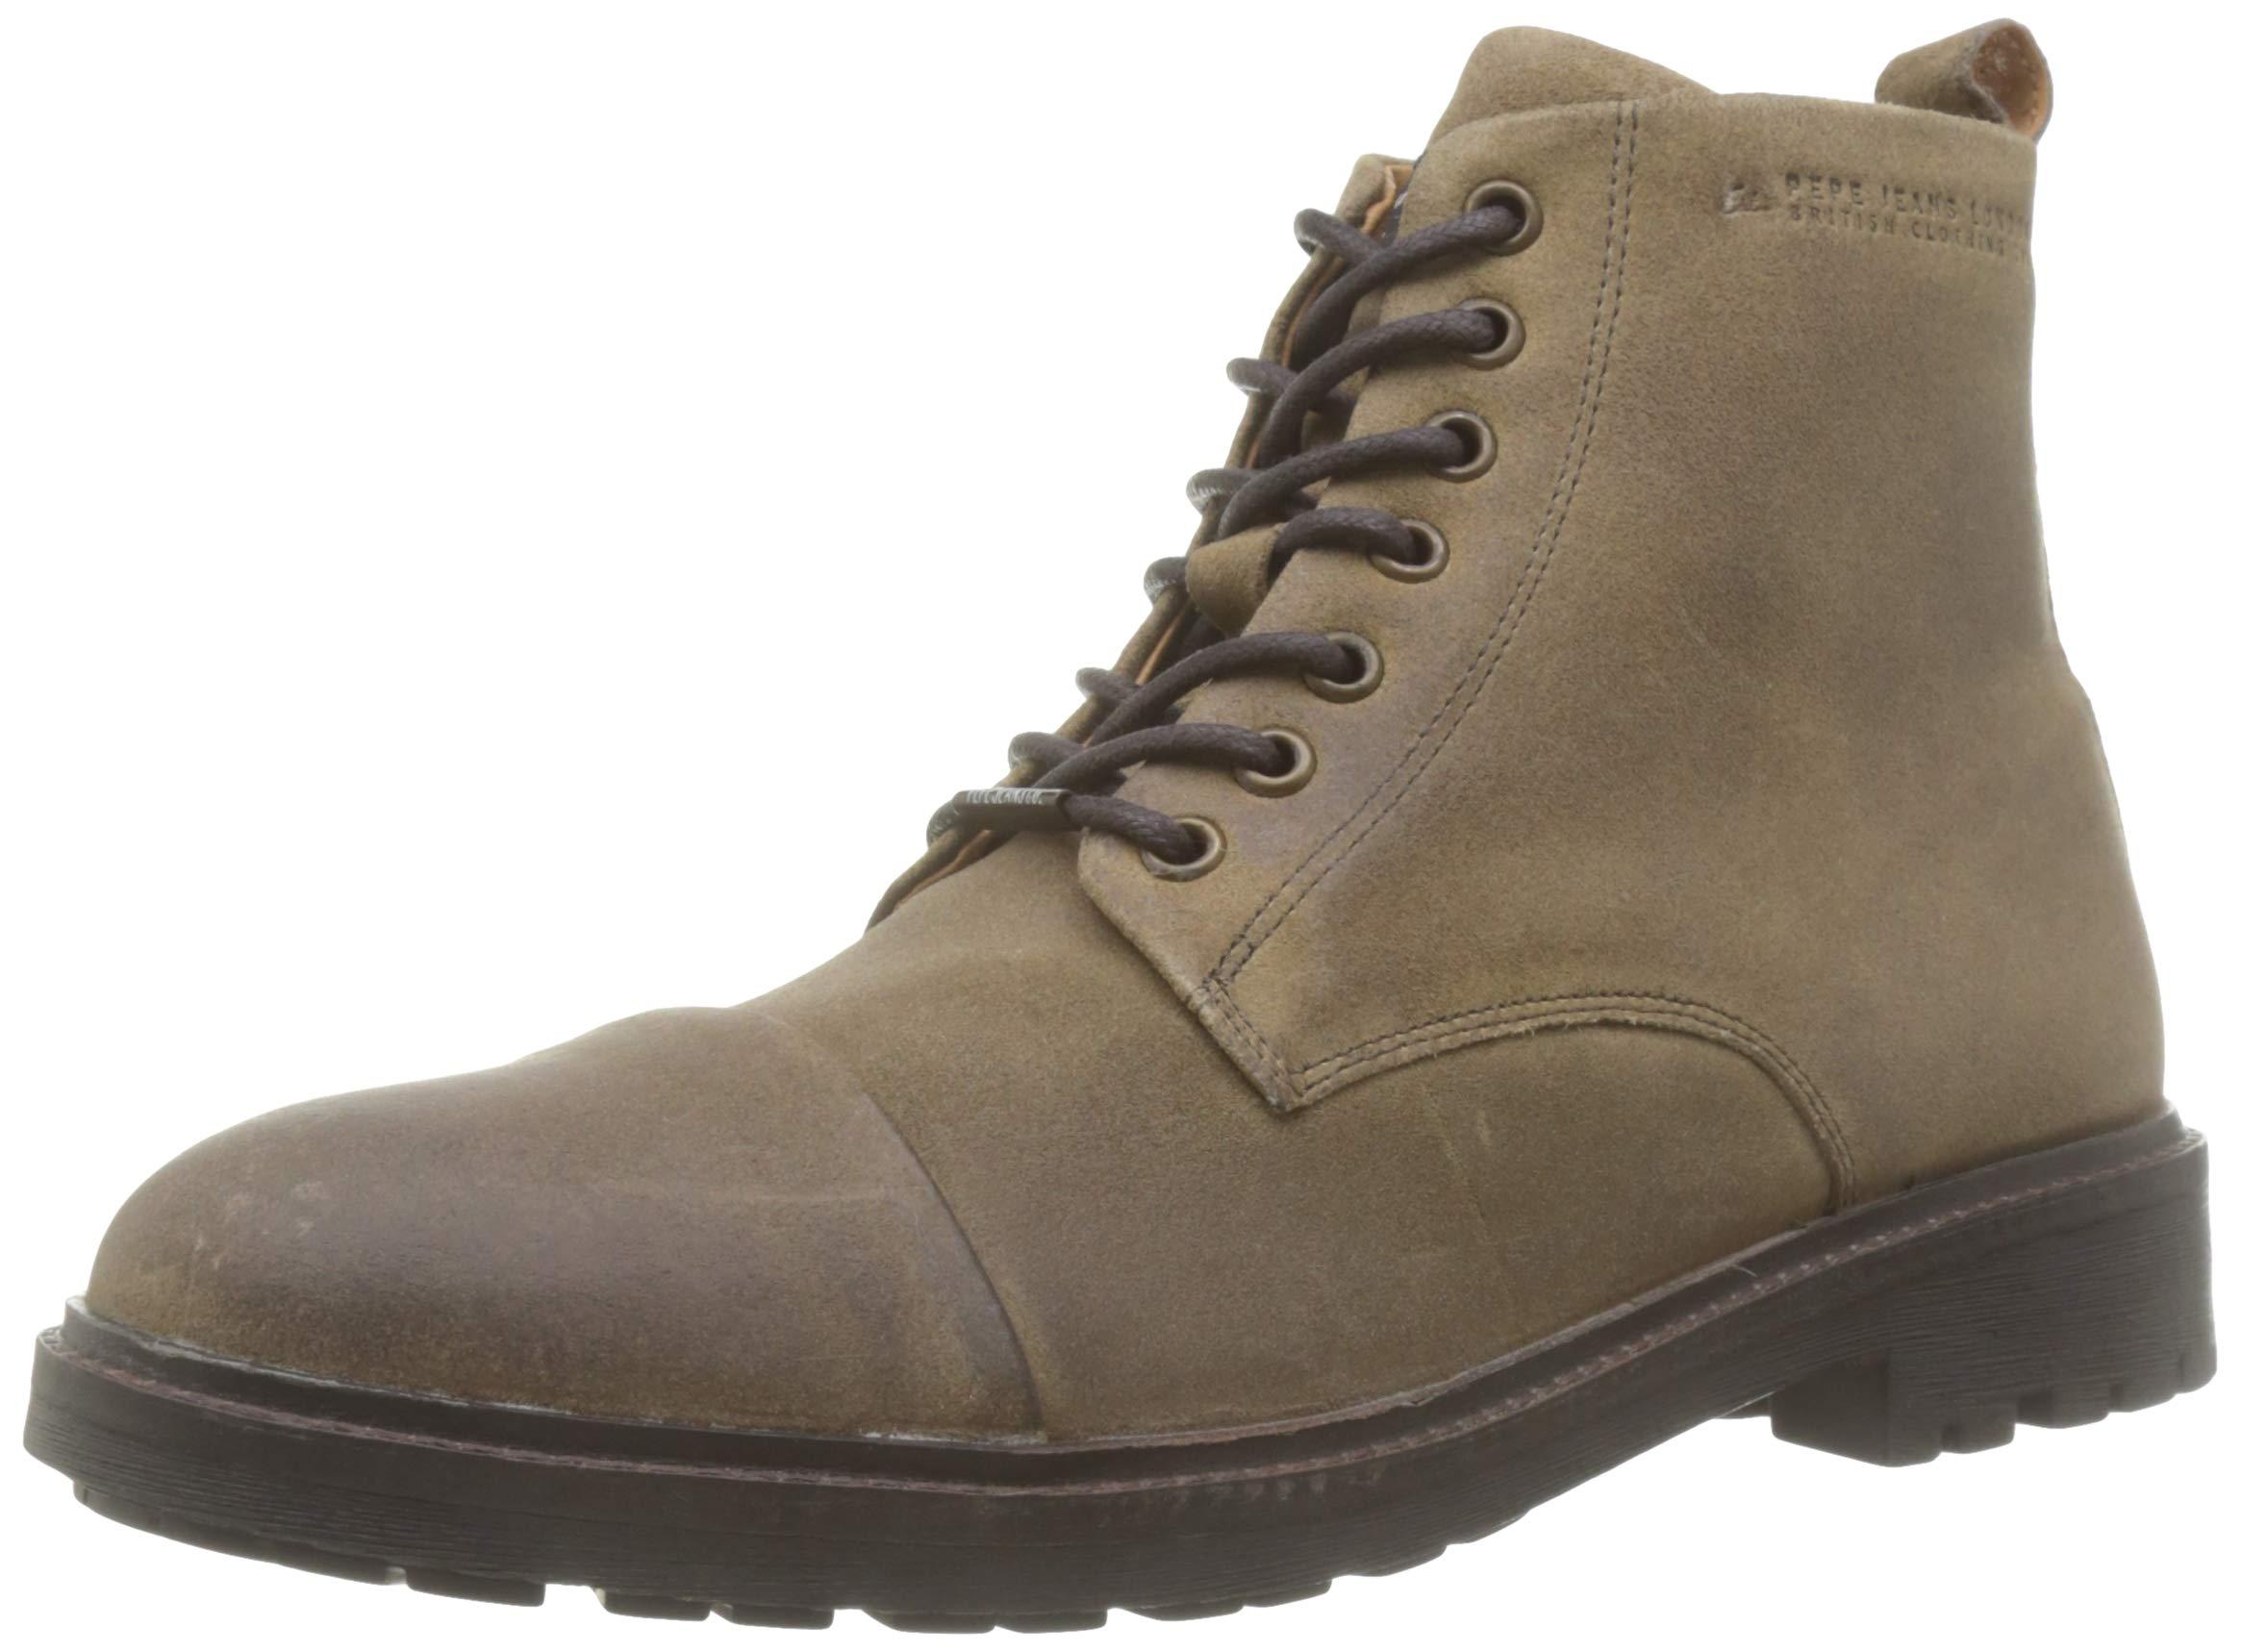 Pepe Jeans London Herren Porter Suede Desert Boots, Braun (Tan 869), 44 EU